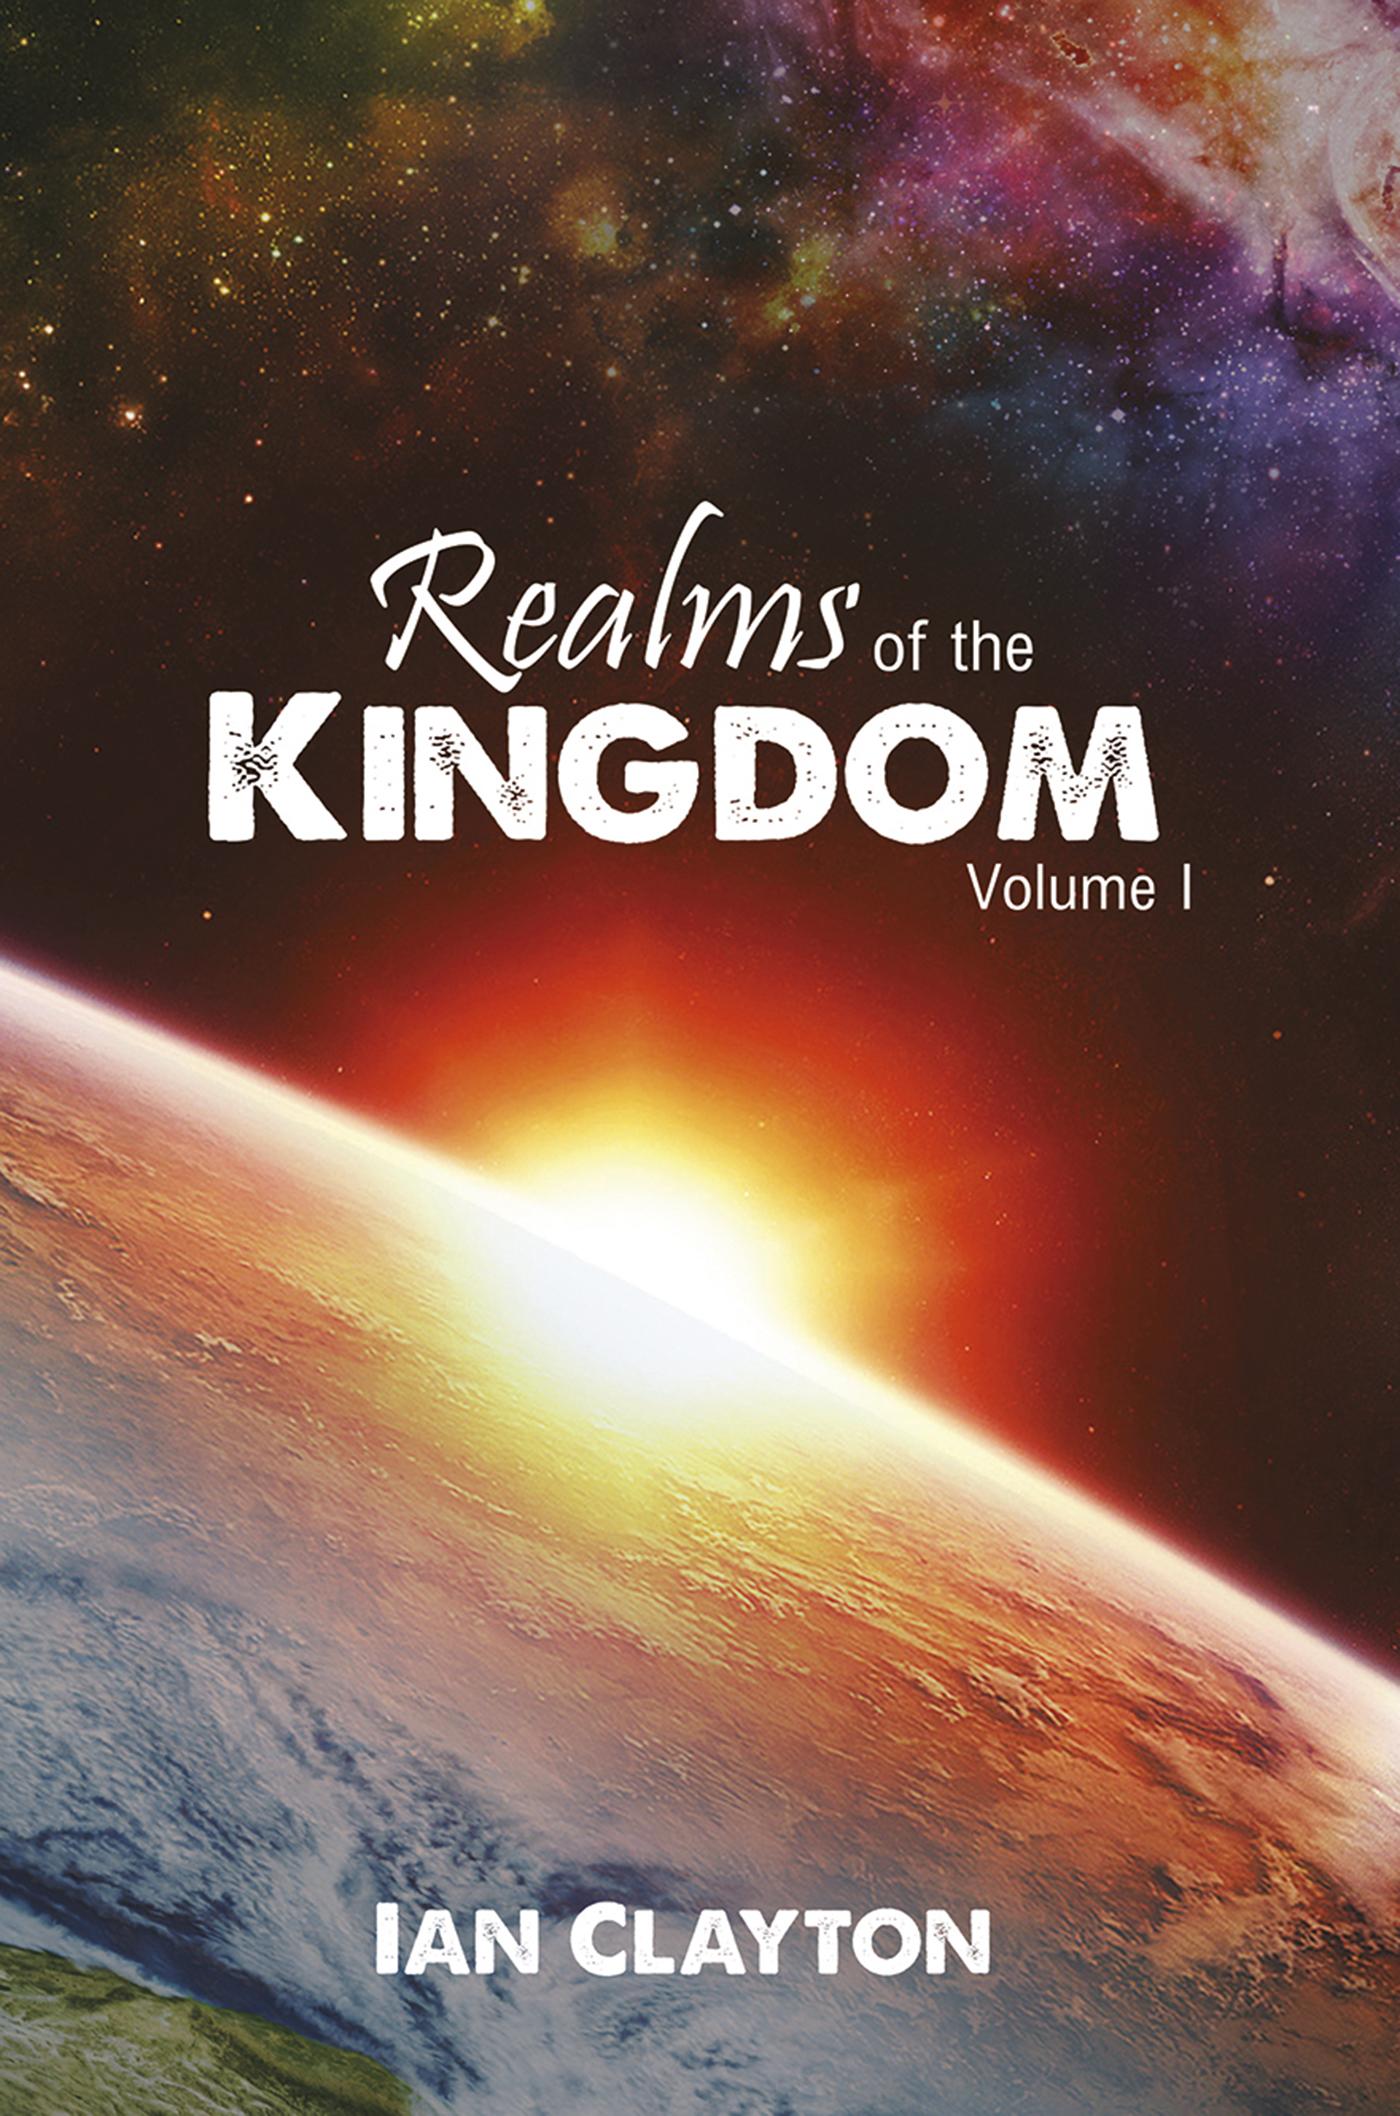 Realms of the Kingdom